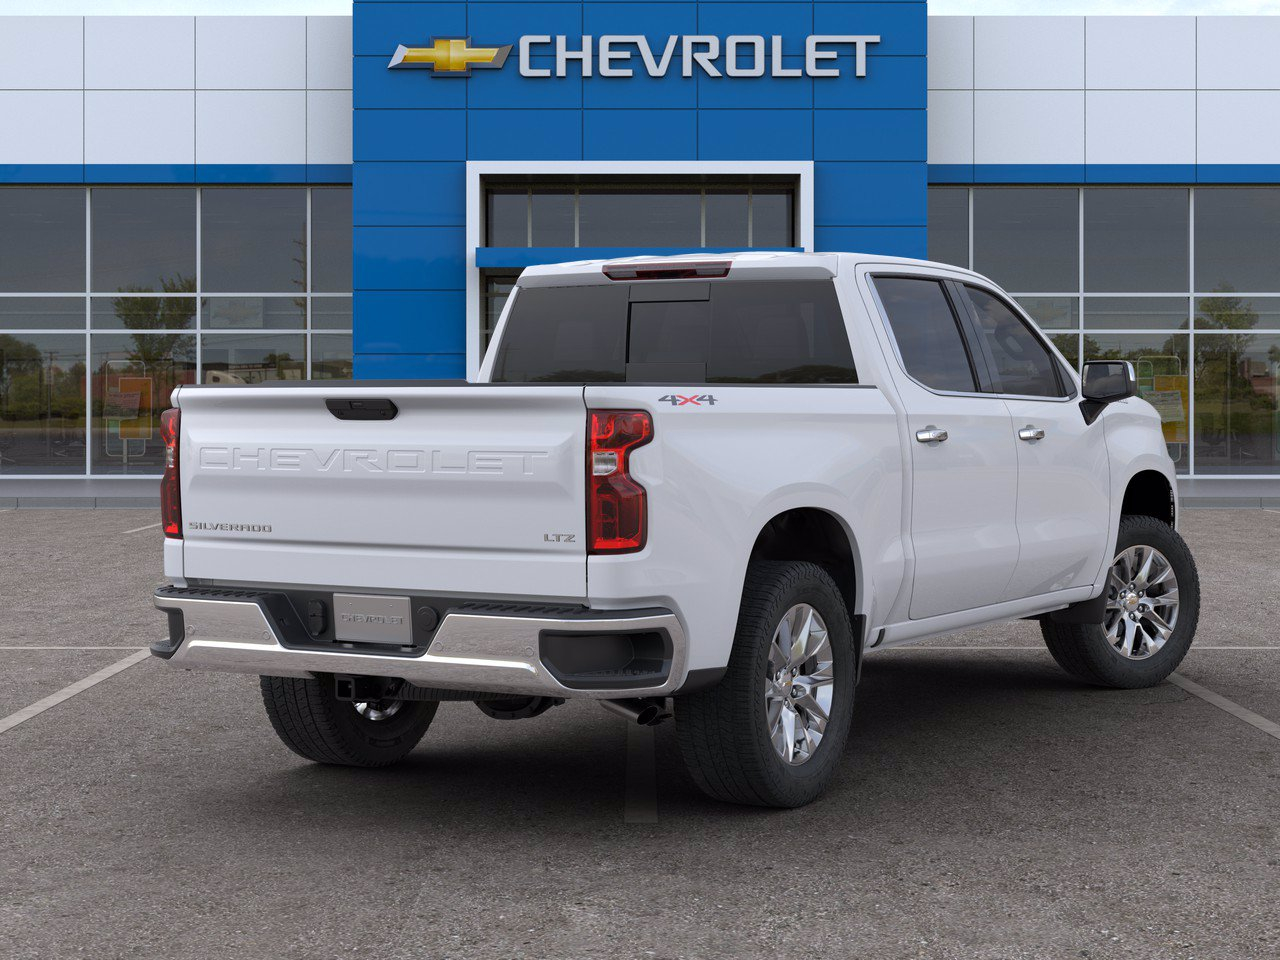 2020 Chevrolet Silverado 1500 Crew Cab 4x4, Pickup #C201706 - photo 2